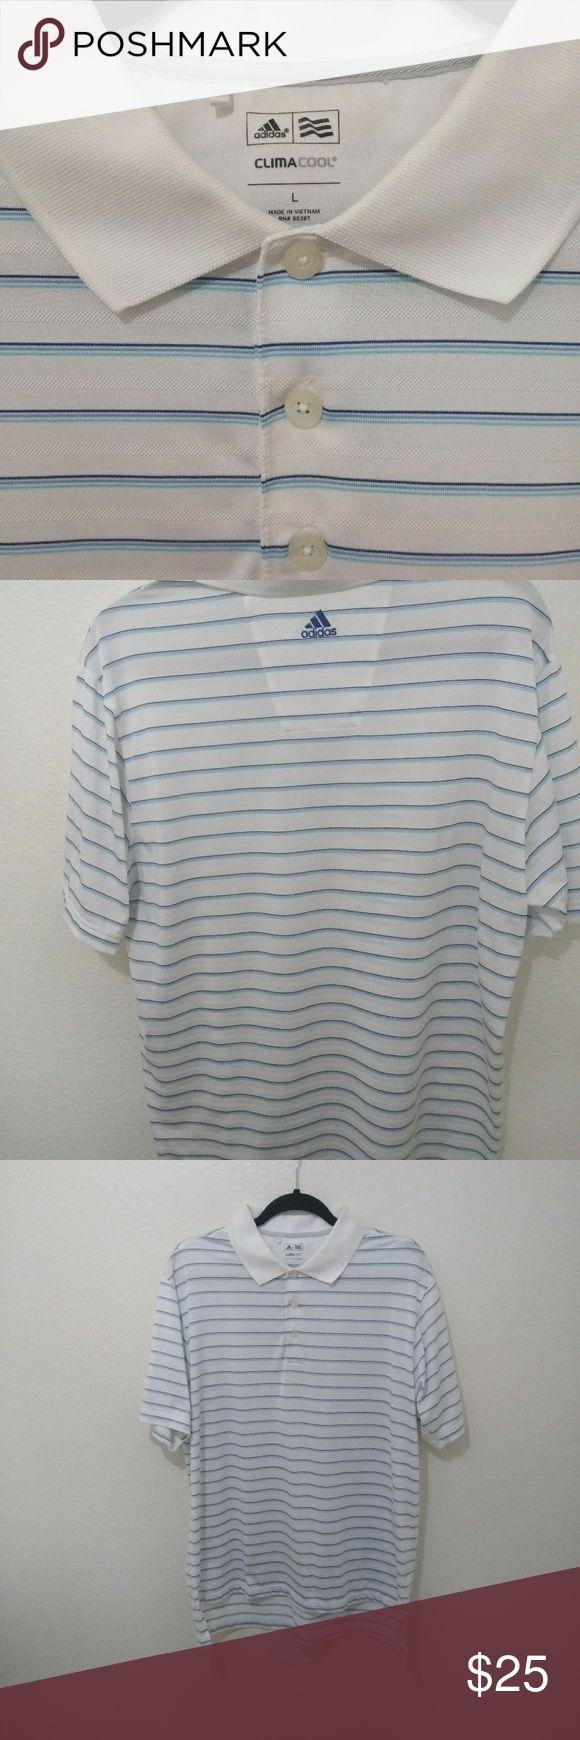 Addidas Climacool Golf Polo Shirt Addidas Climacool Stripped Athletic White,Blue Golf Polo Short Sleeve Shirt. Addidas Shirts Polos